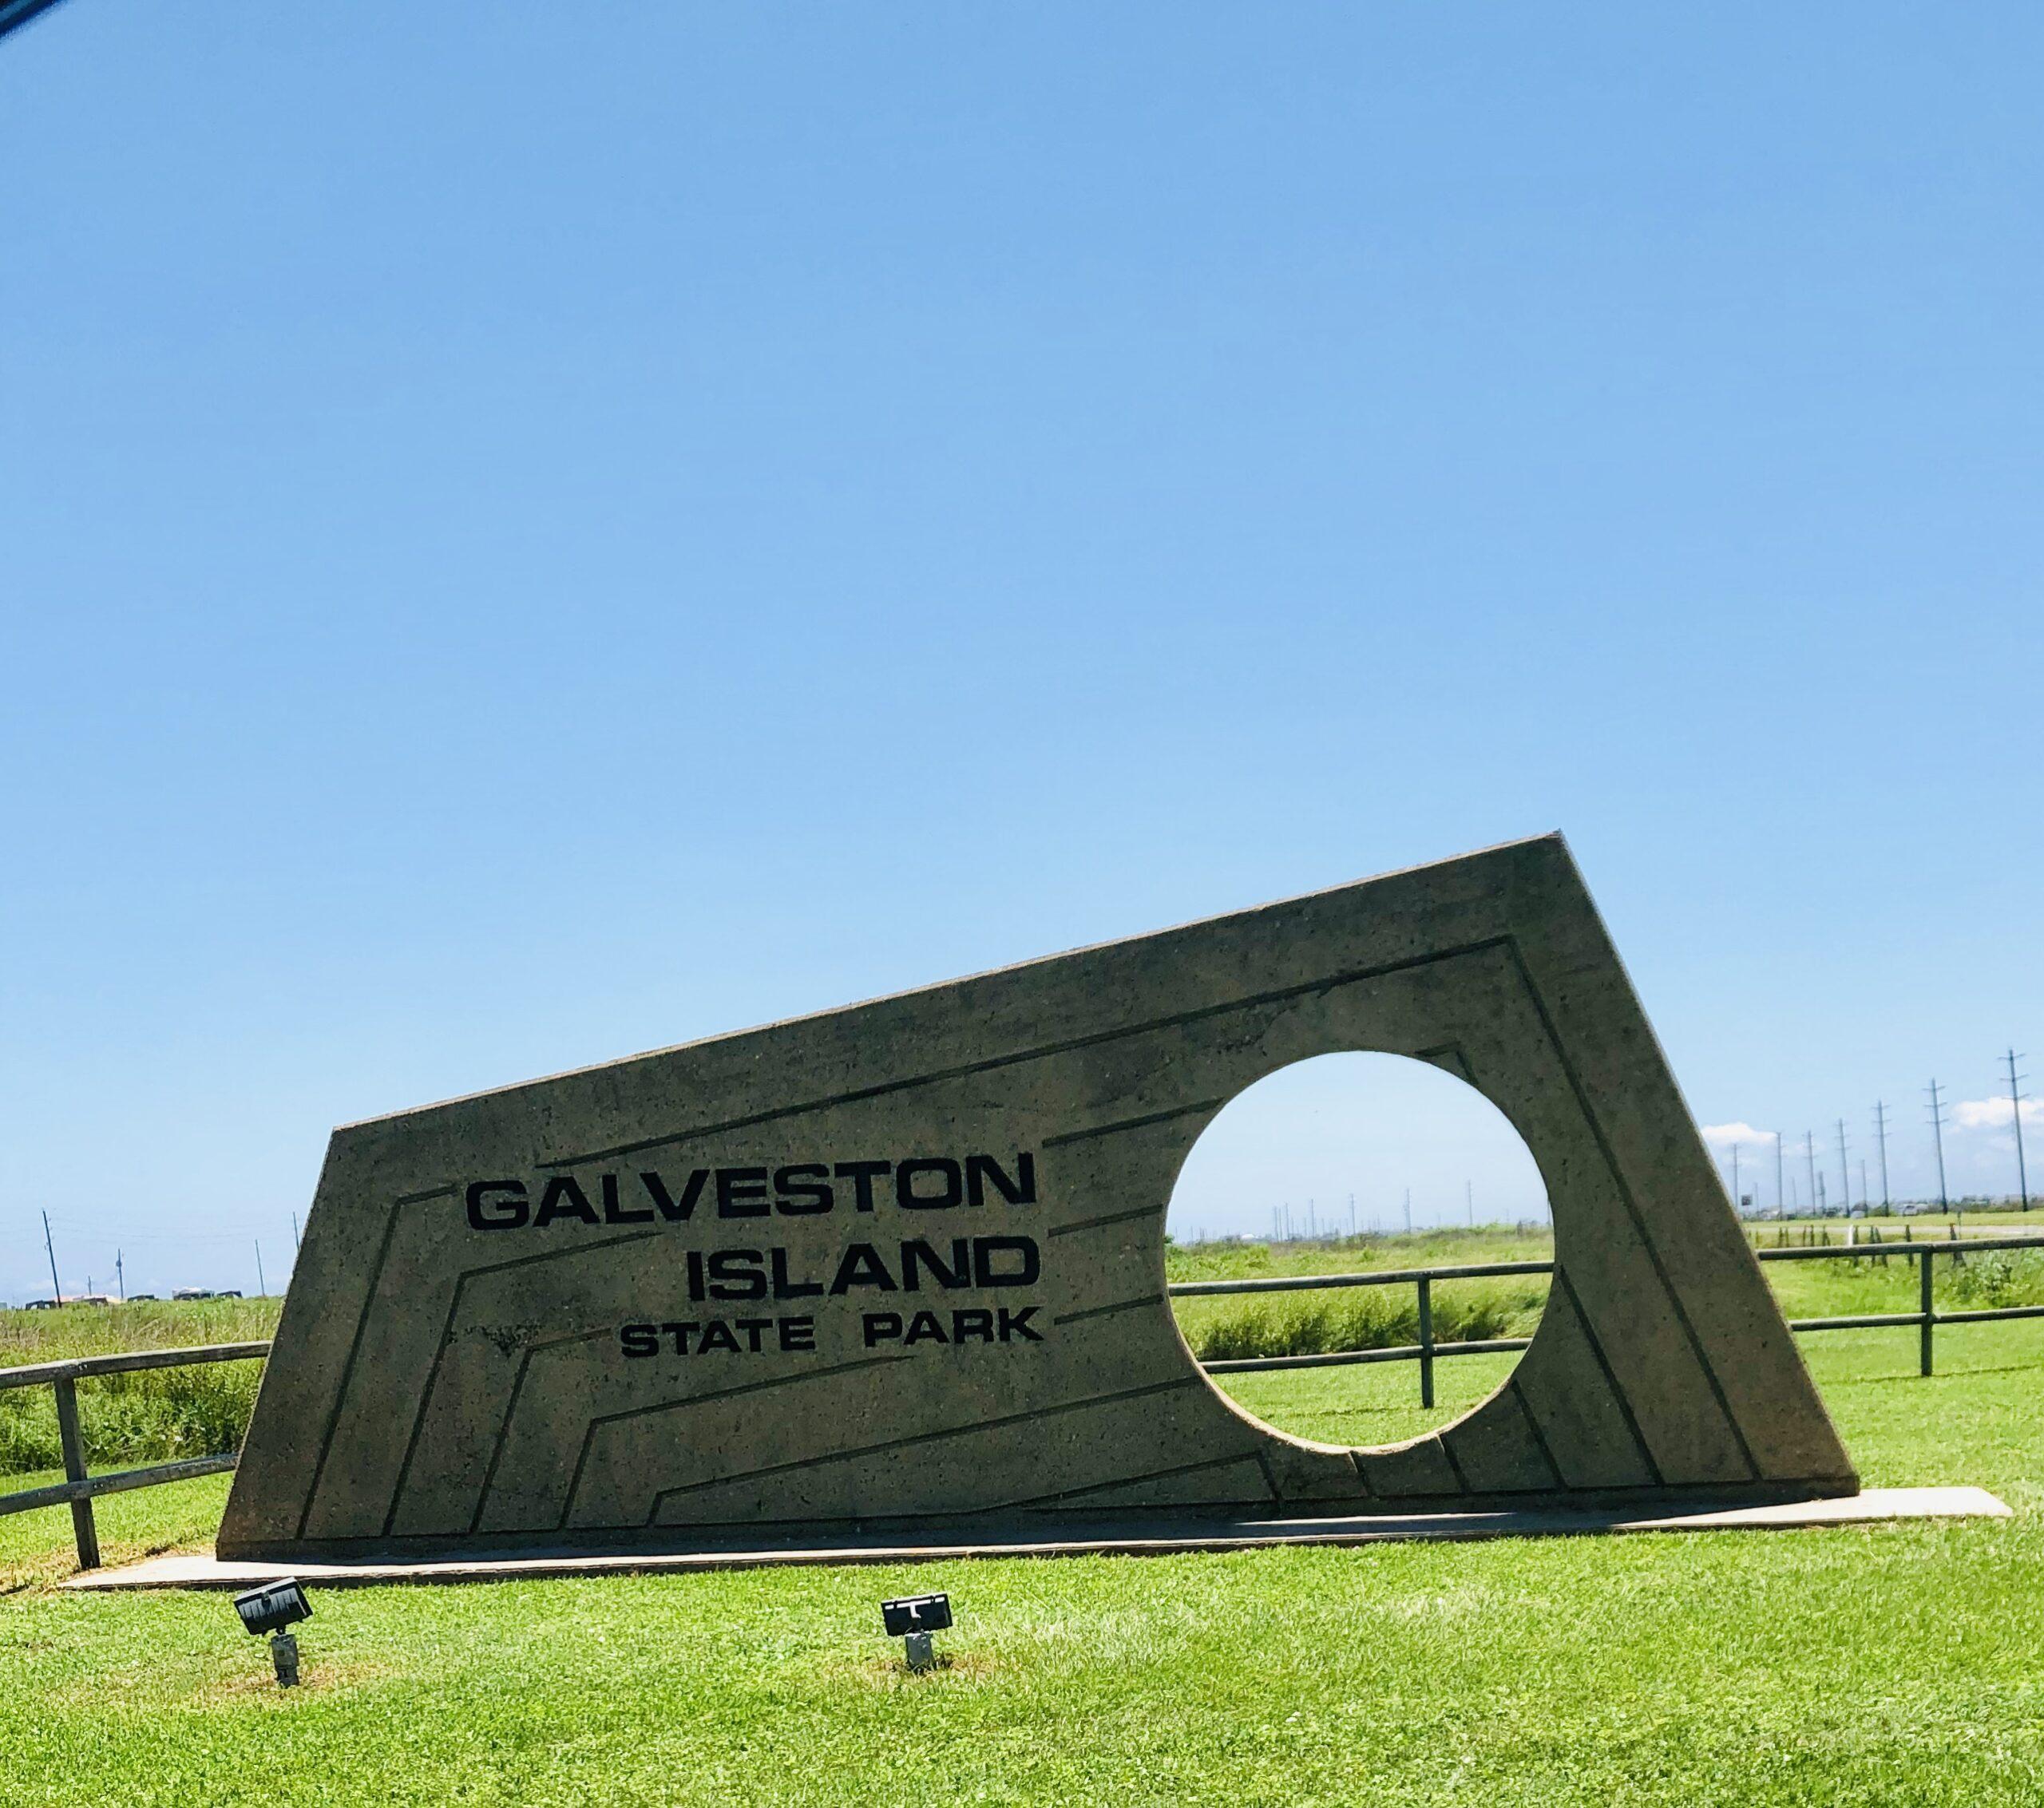 Galveston Island State Park - The Texas Trailhead